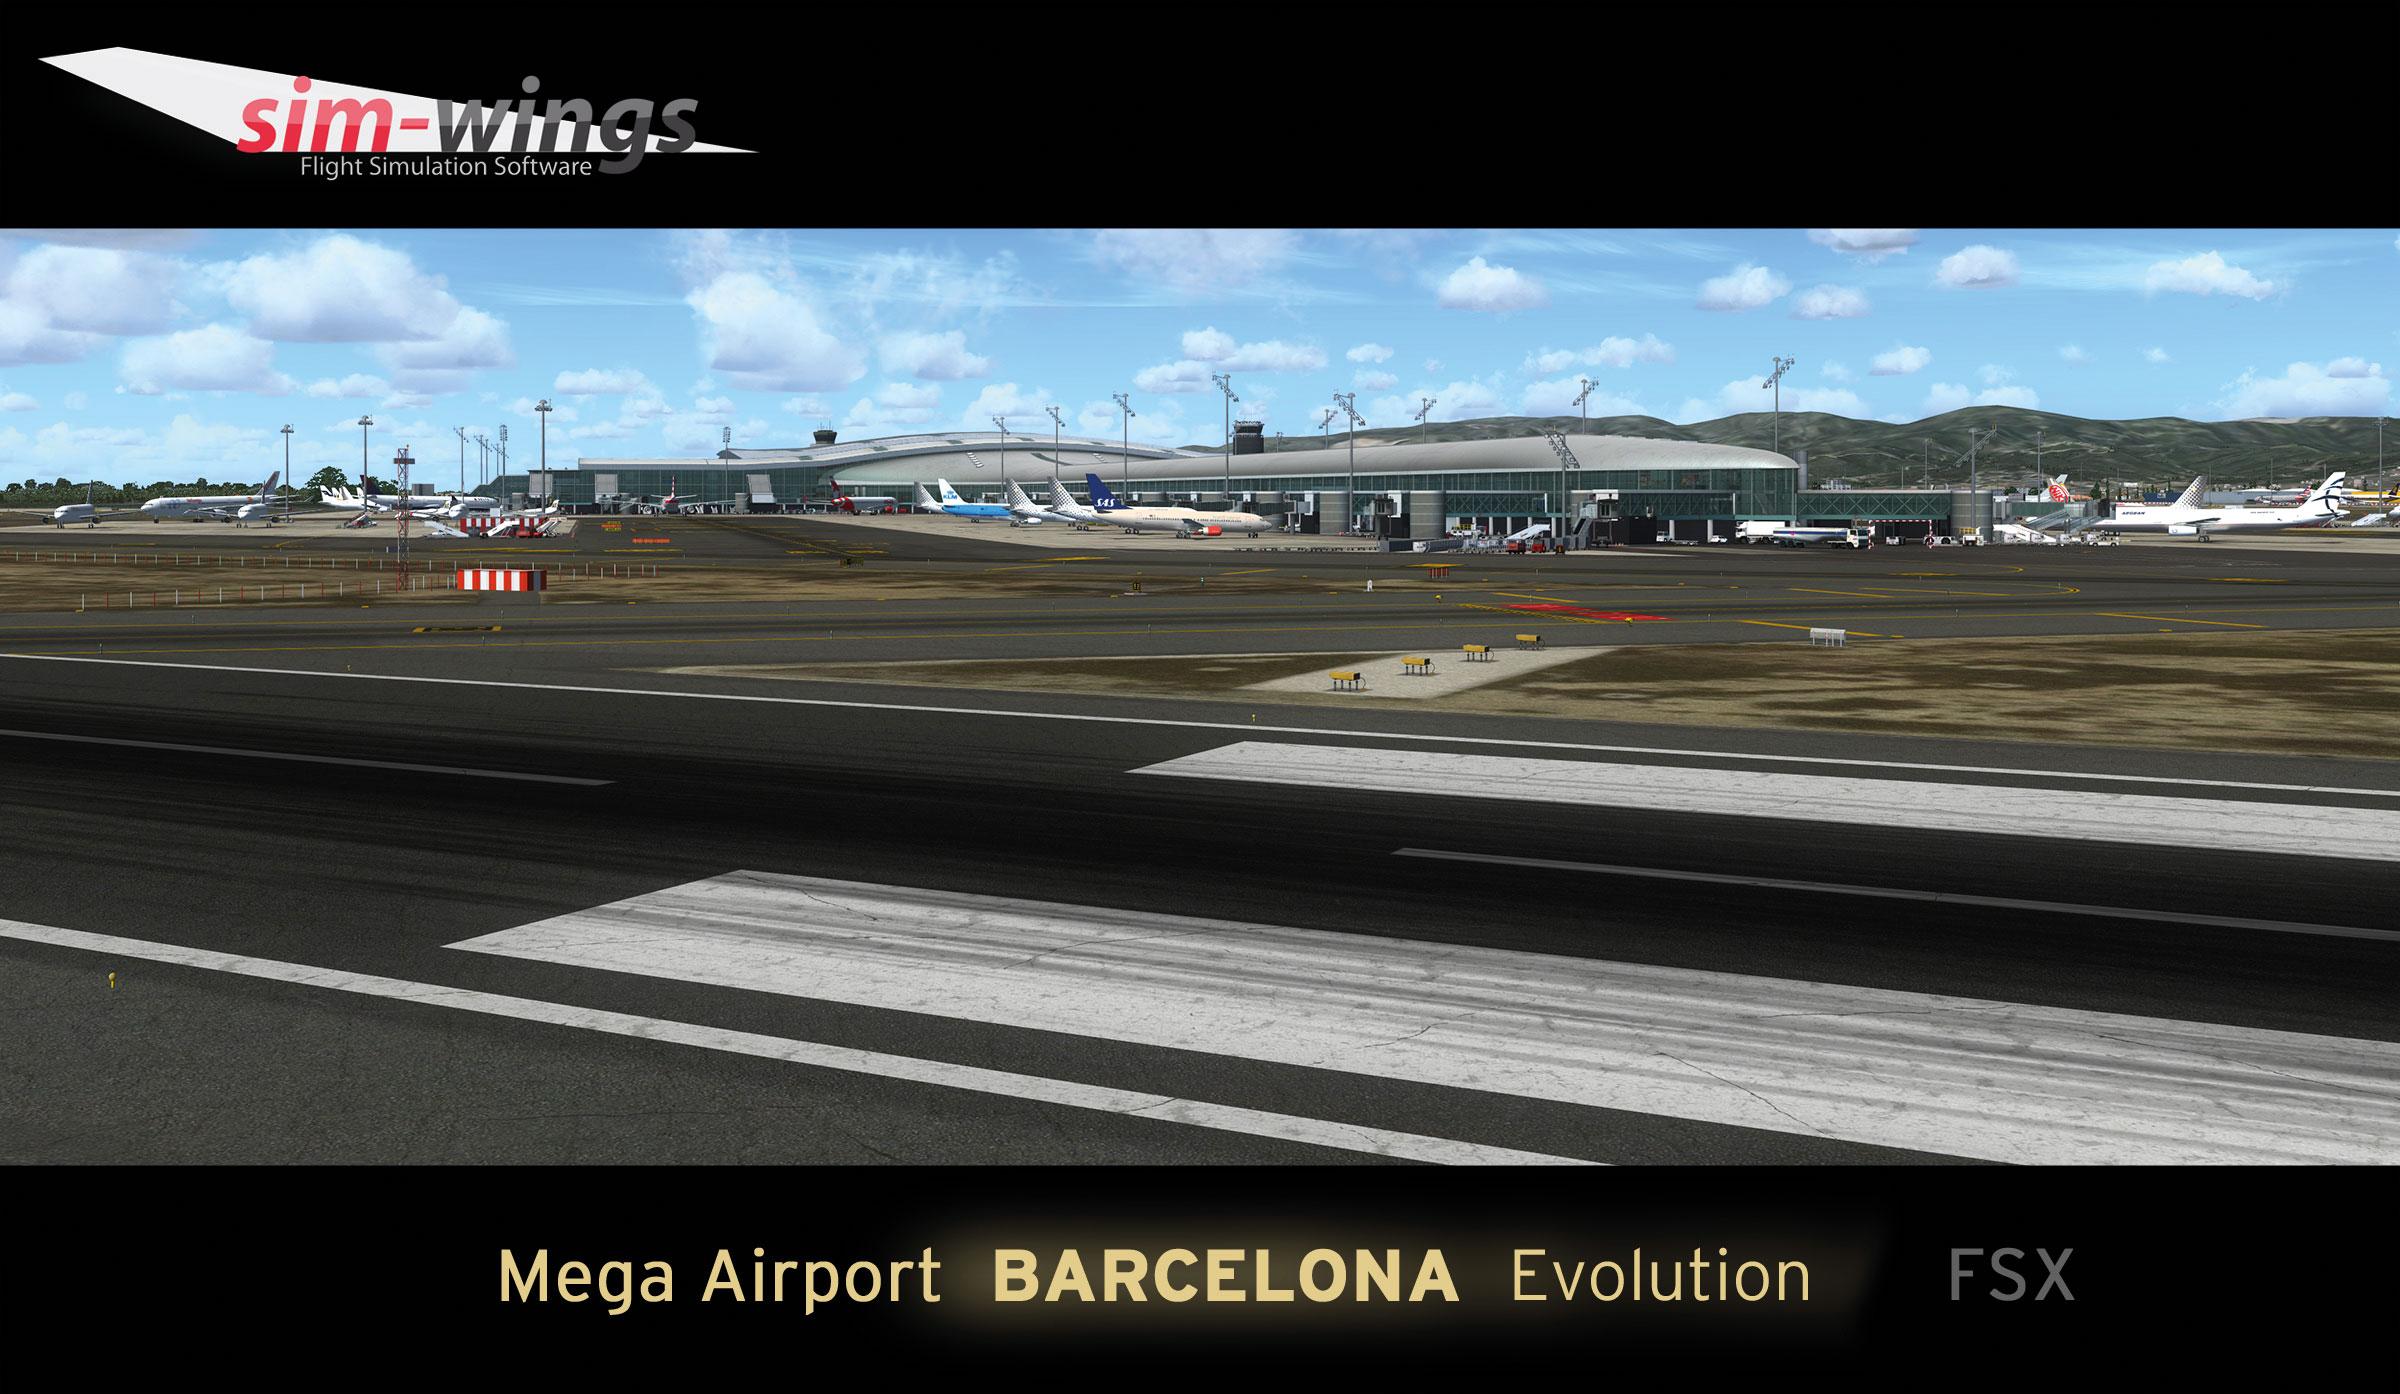 Fsx Mega Airport barcelona X